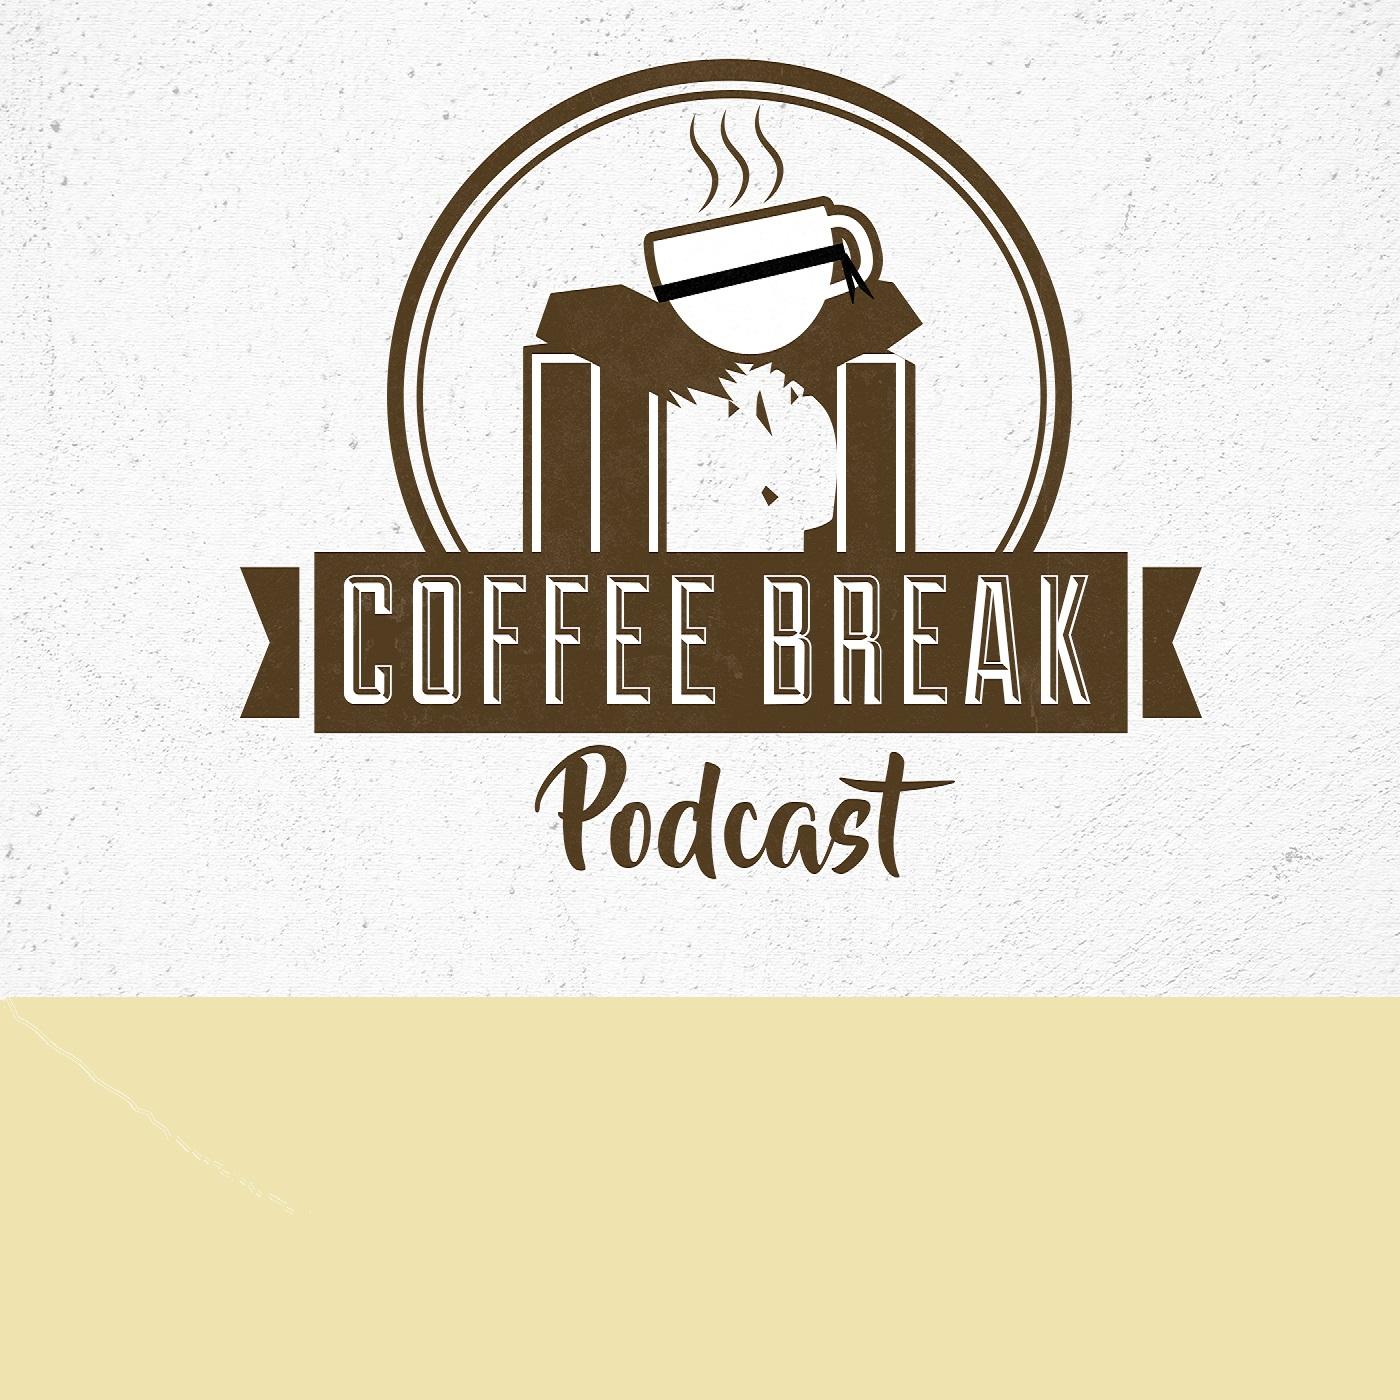 My Coffee Break Podcast